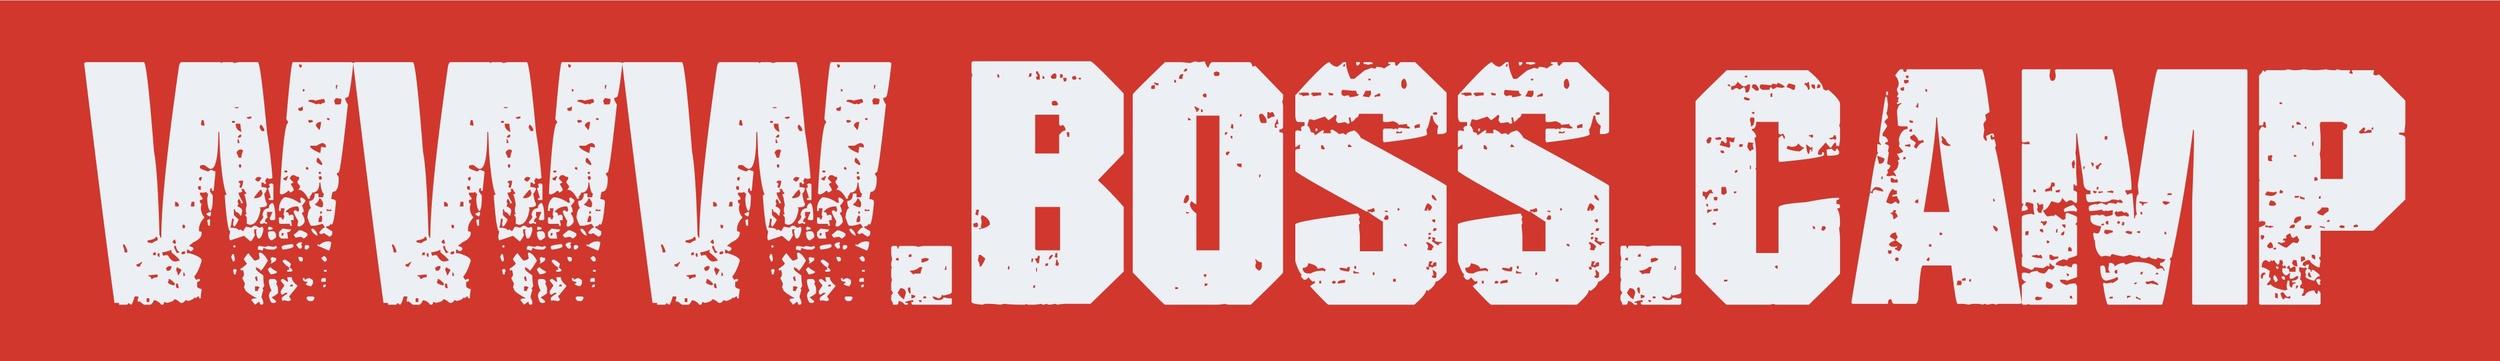 Make work work with www.boss.camp jpeg